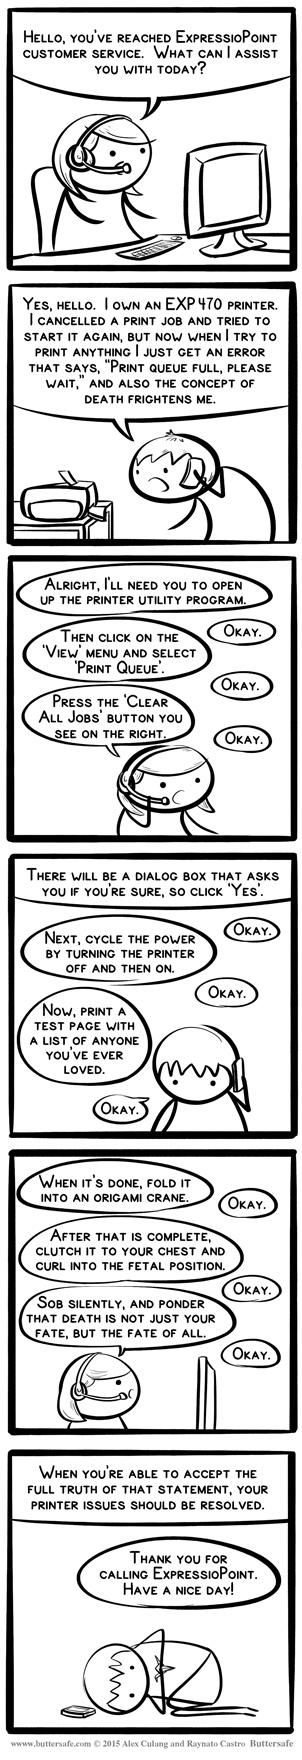 printer trouble